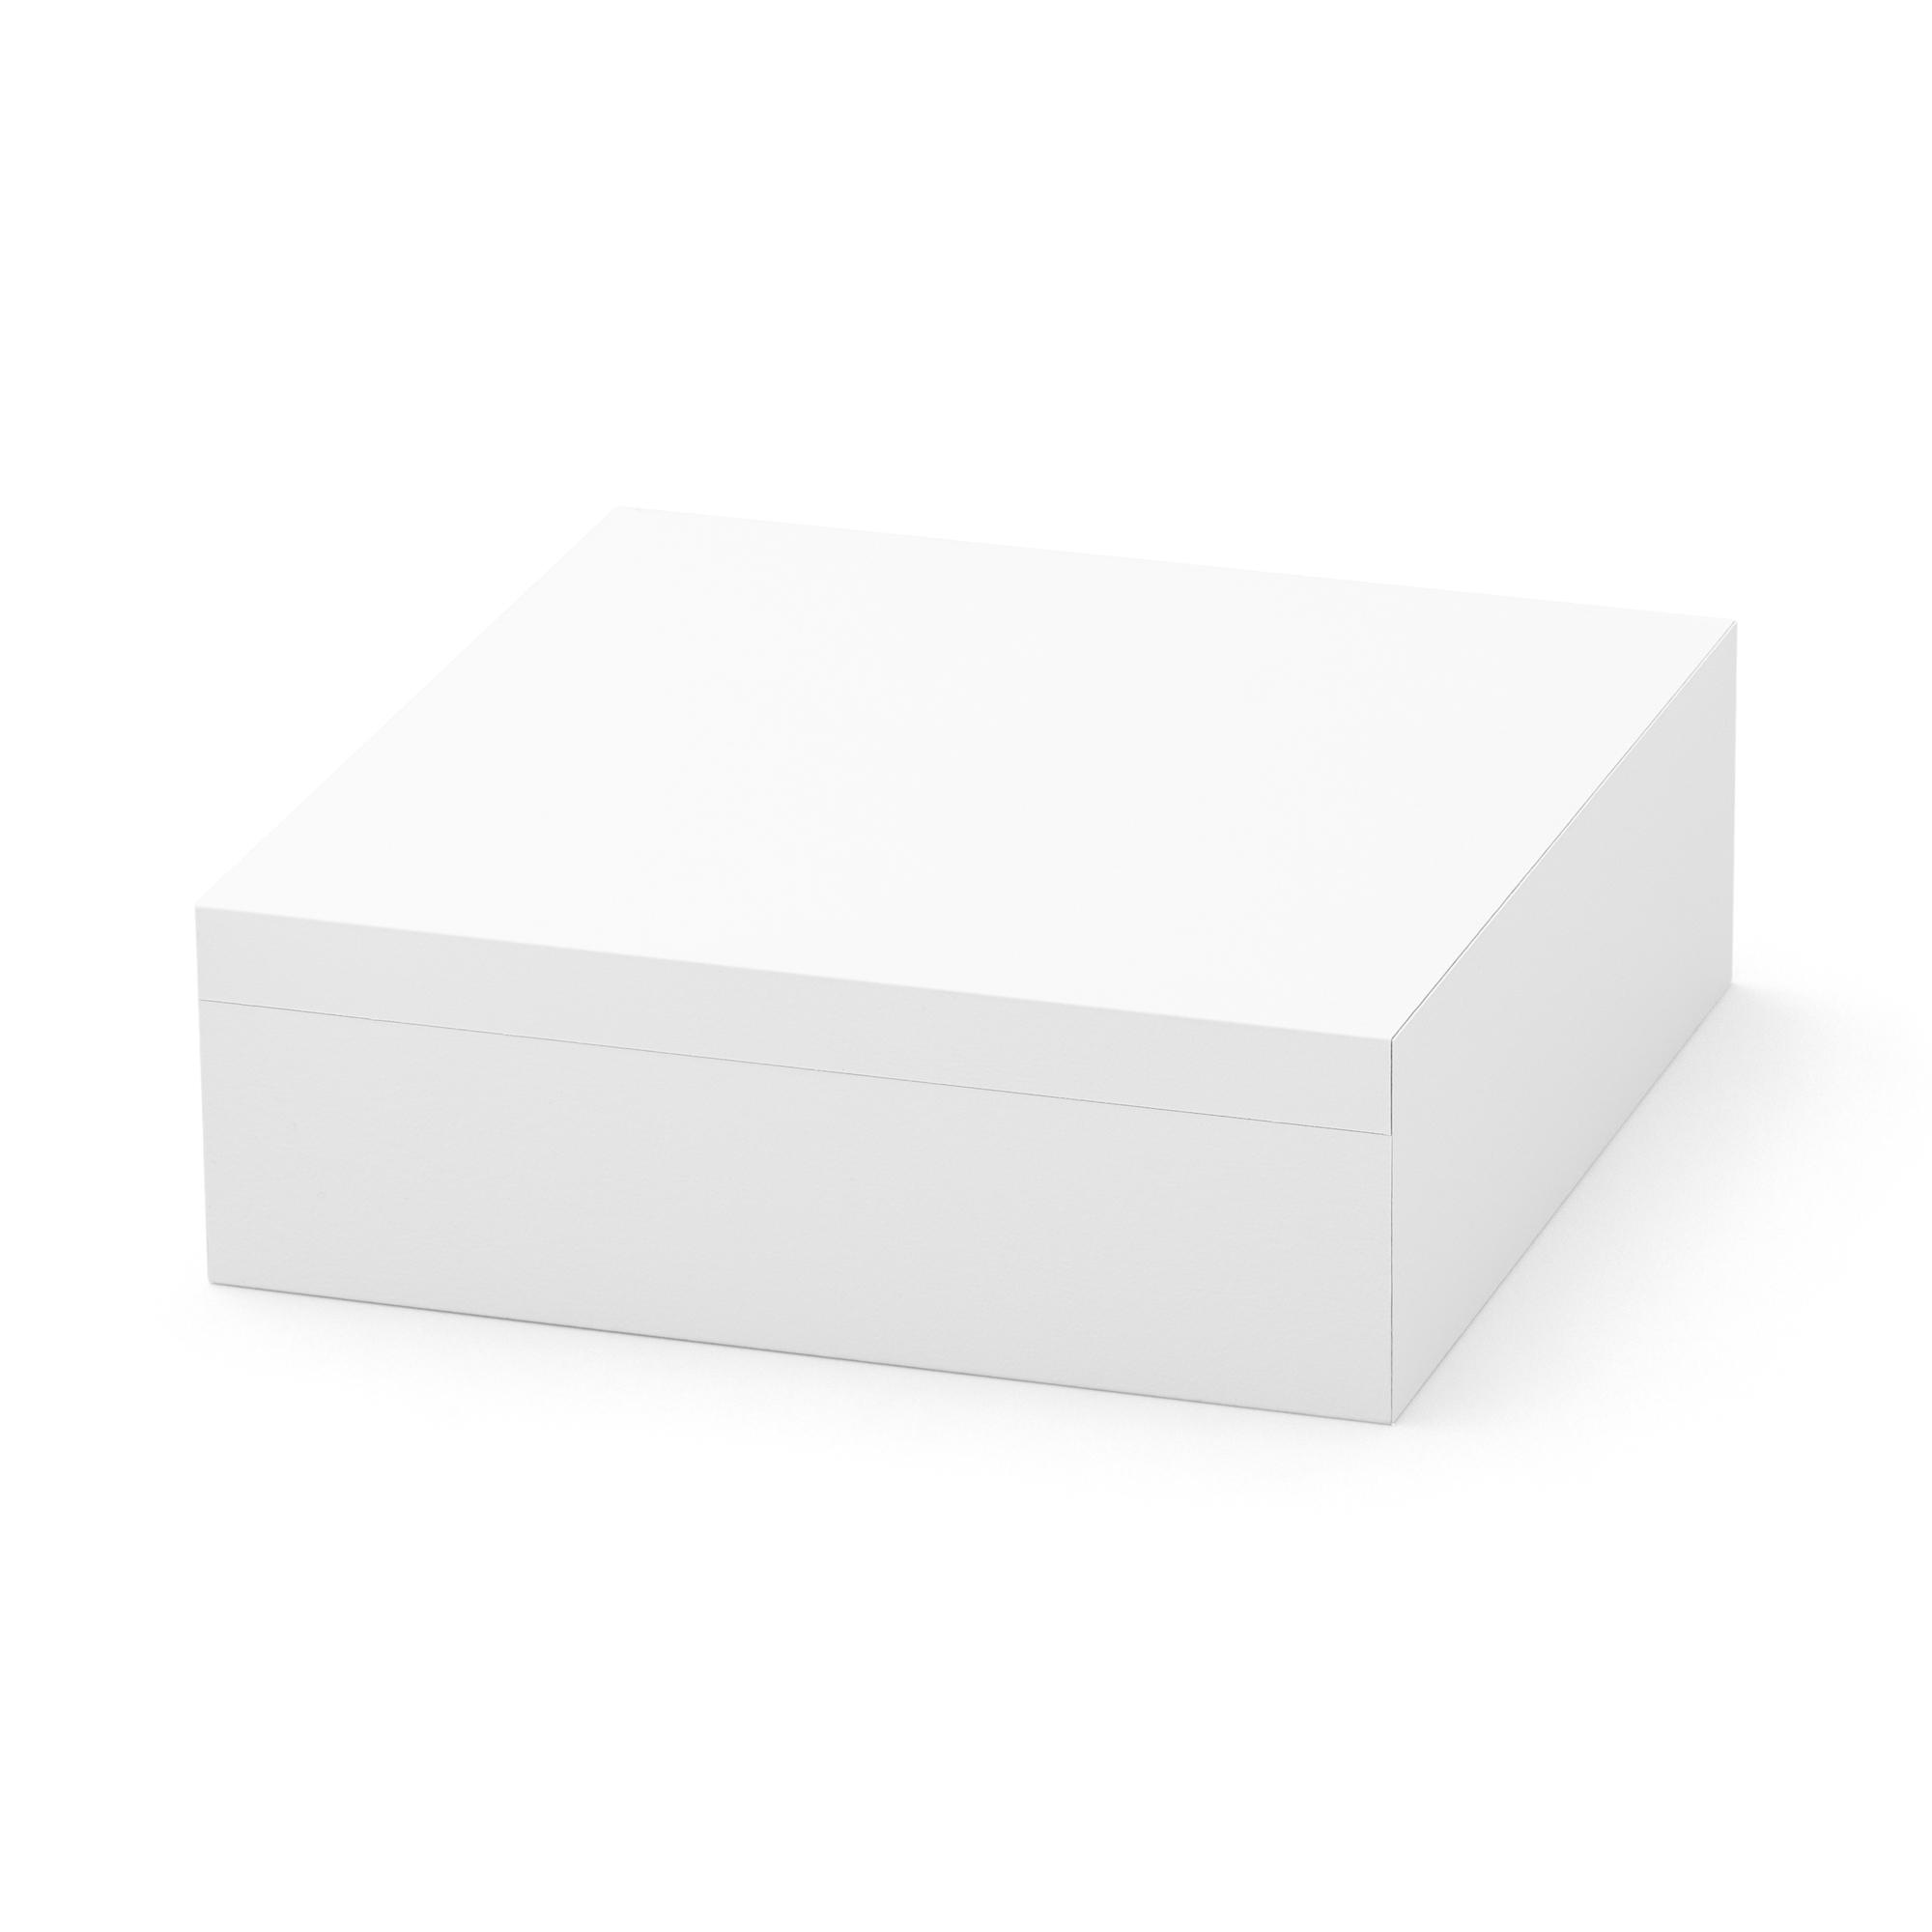 WHITEBOX Universal groß